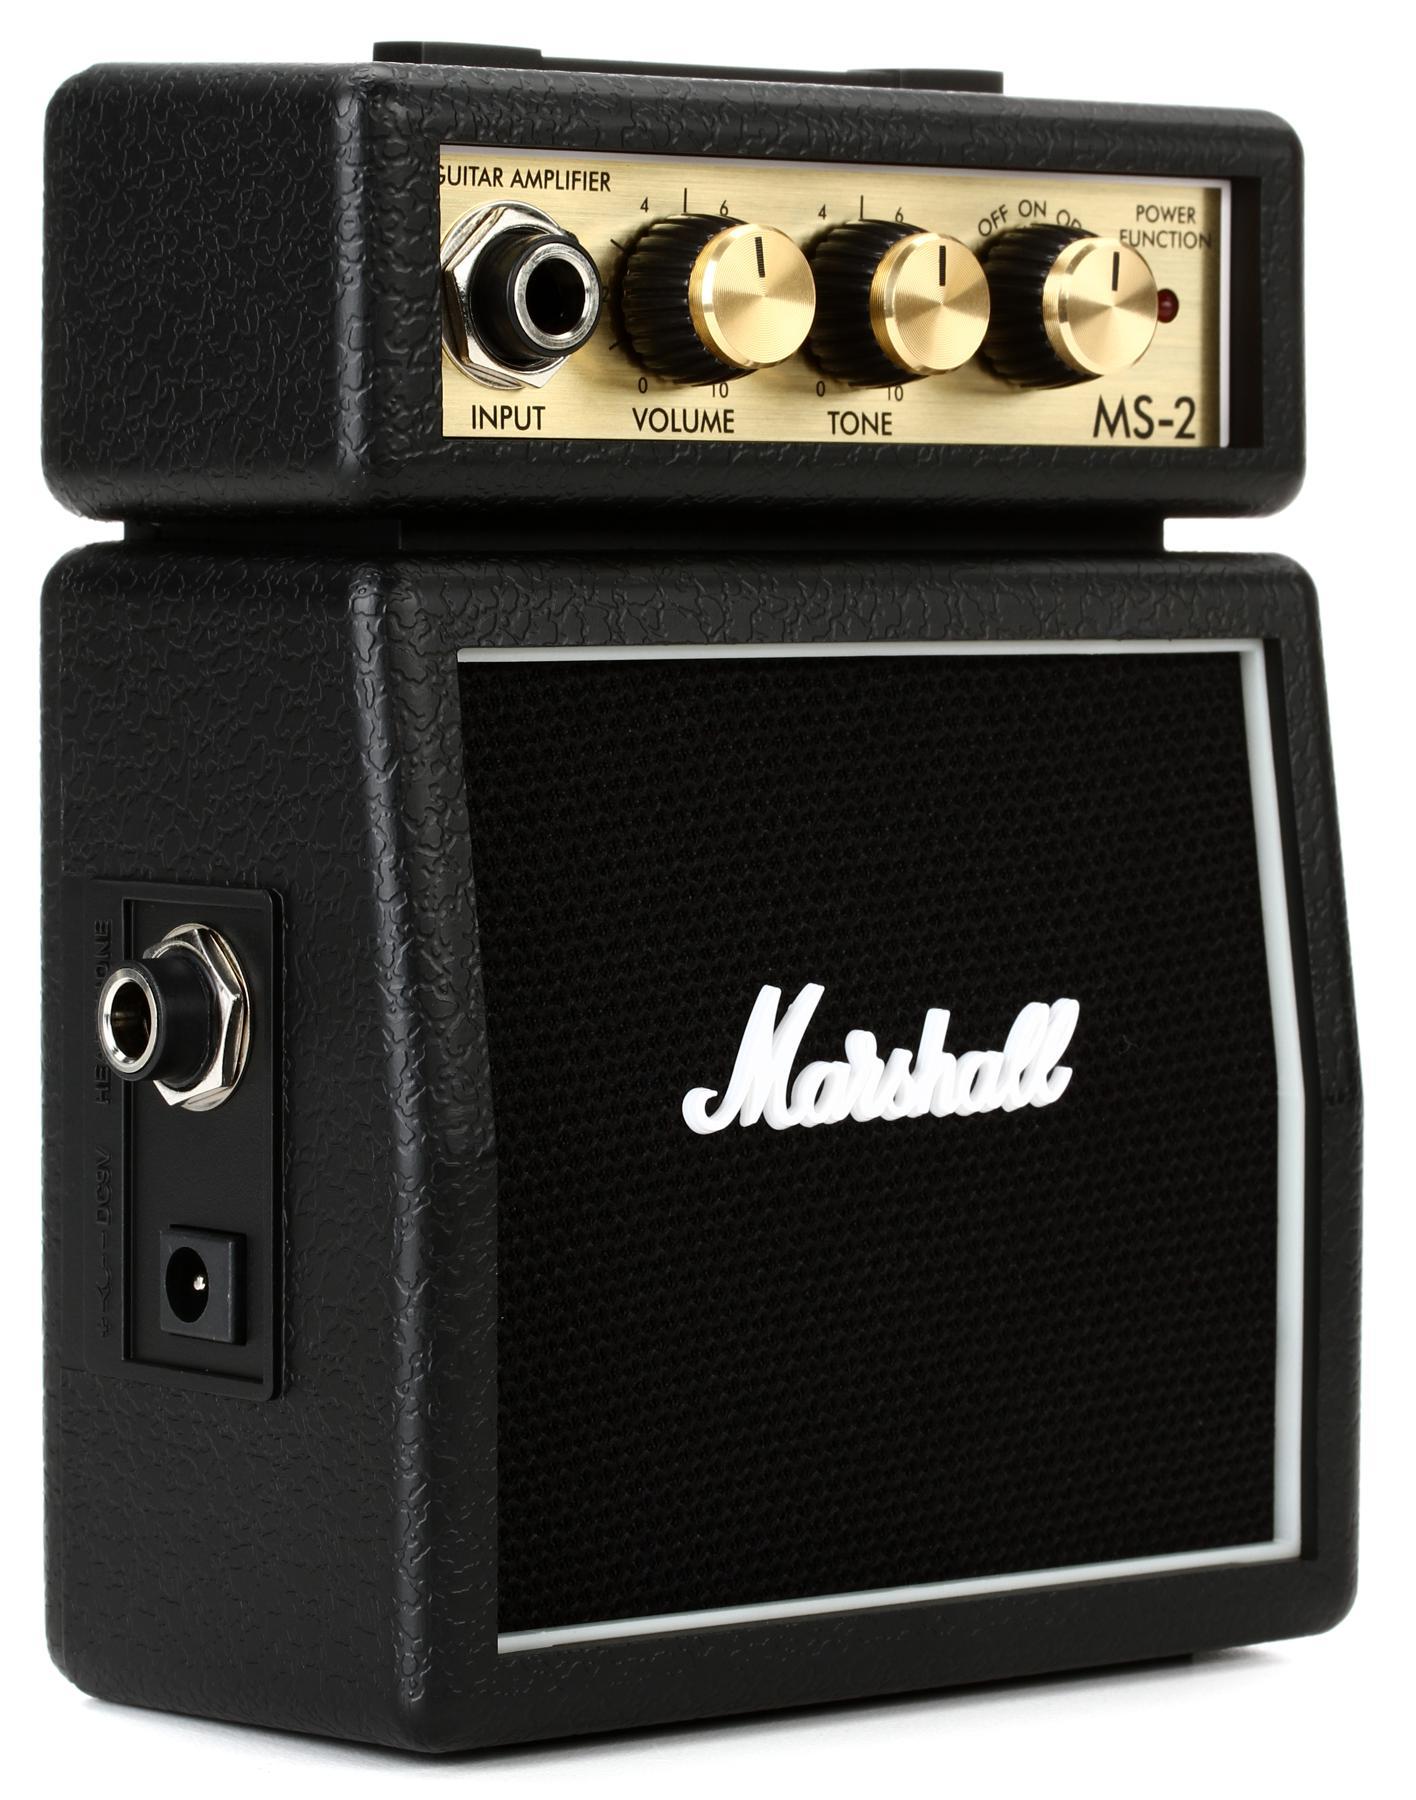 2. Marshall MS2 Micro Guitar Amplifier